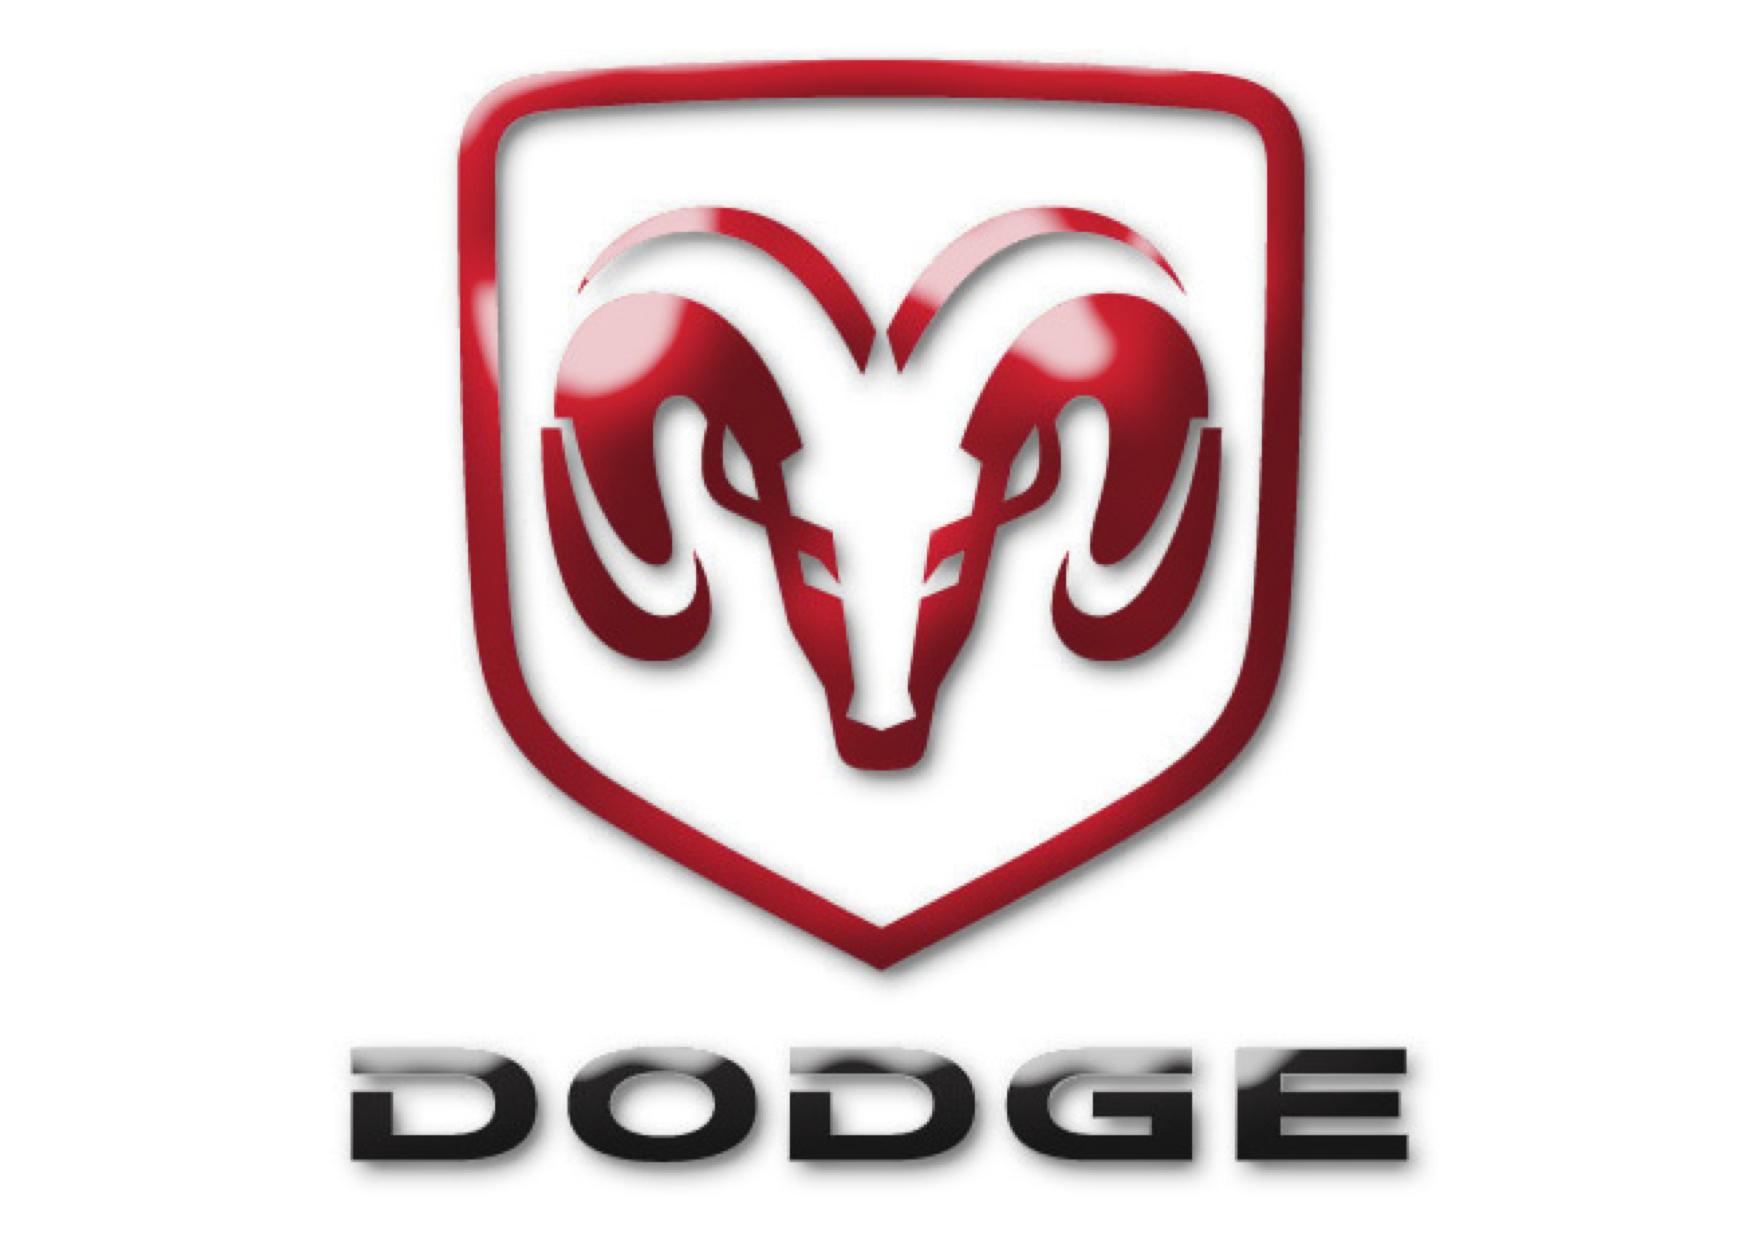 Dodge Ram Wallpaper Logo Tribal 1754x1239